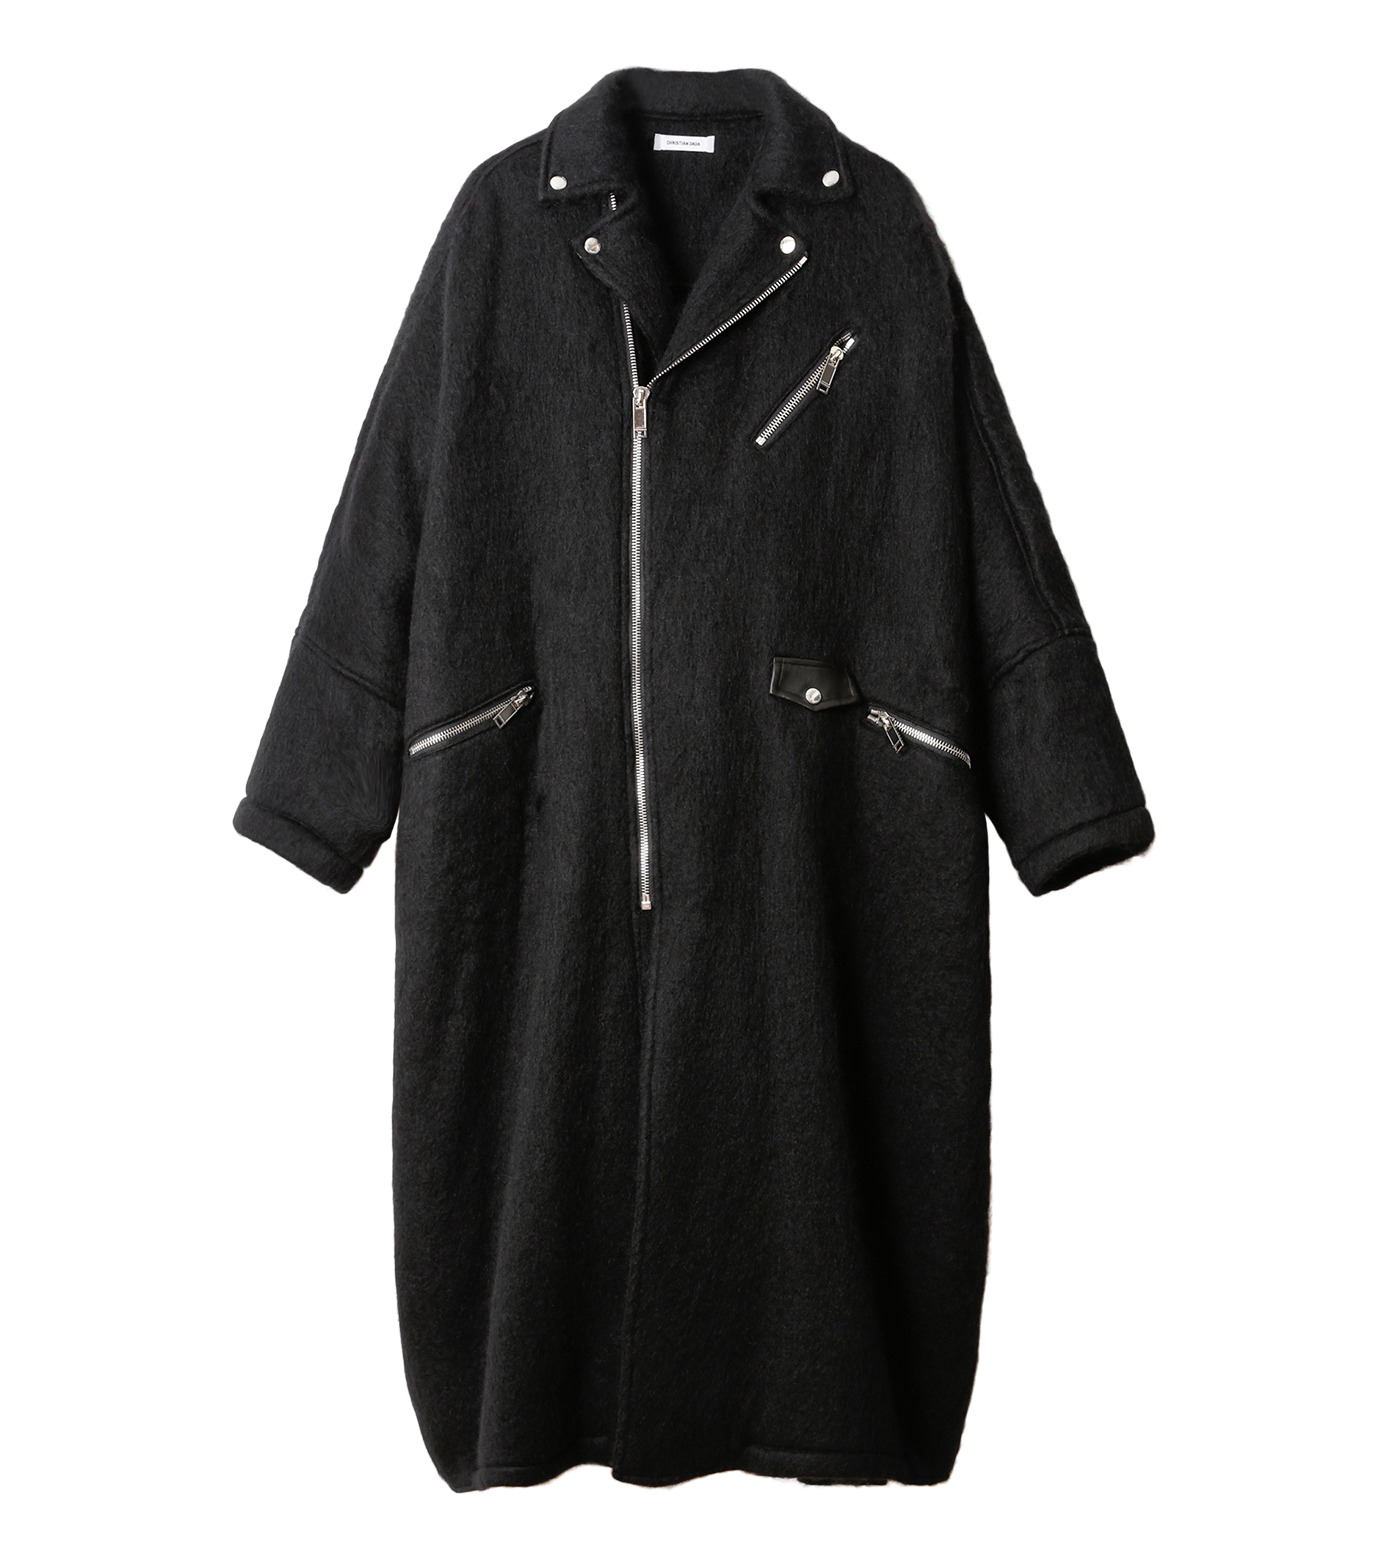 CHRISTIAN DADA(クリスチャン ダダ)のOversized Motorcycle Coat-BLACK(コート/coat)-16W-D-0301-13 拡大詳細画像4